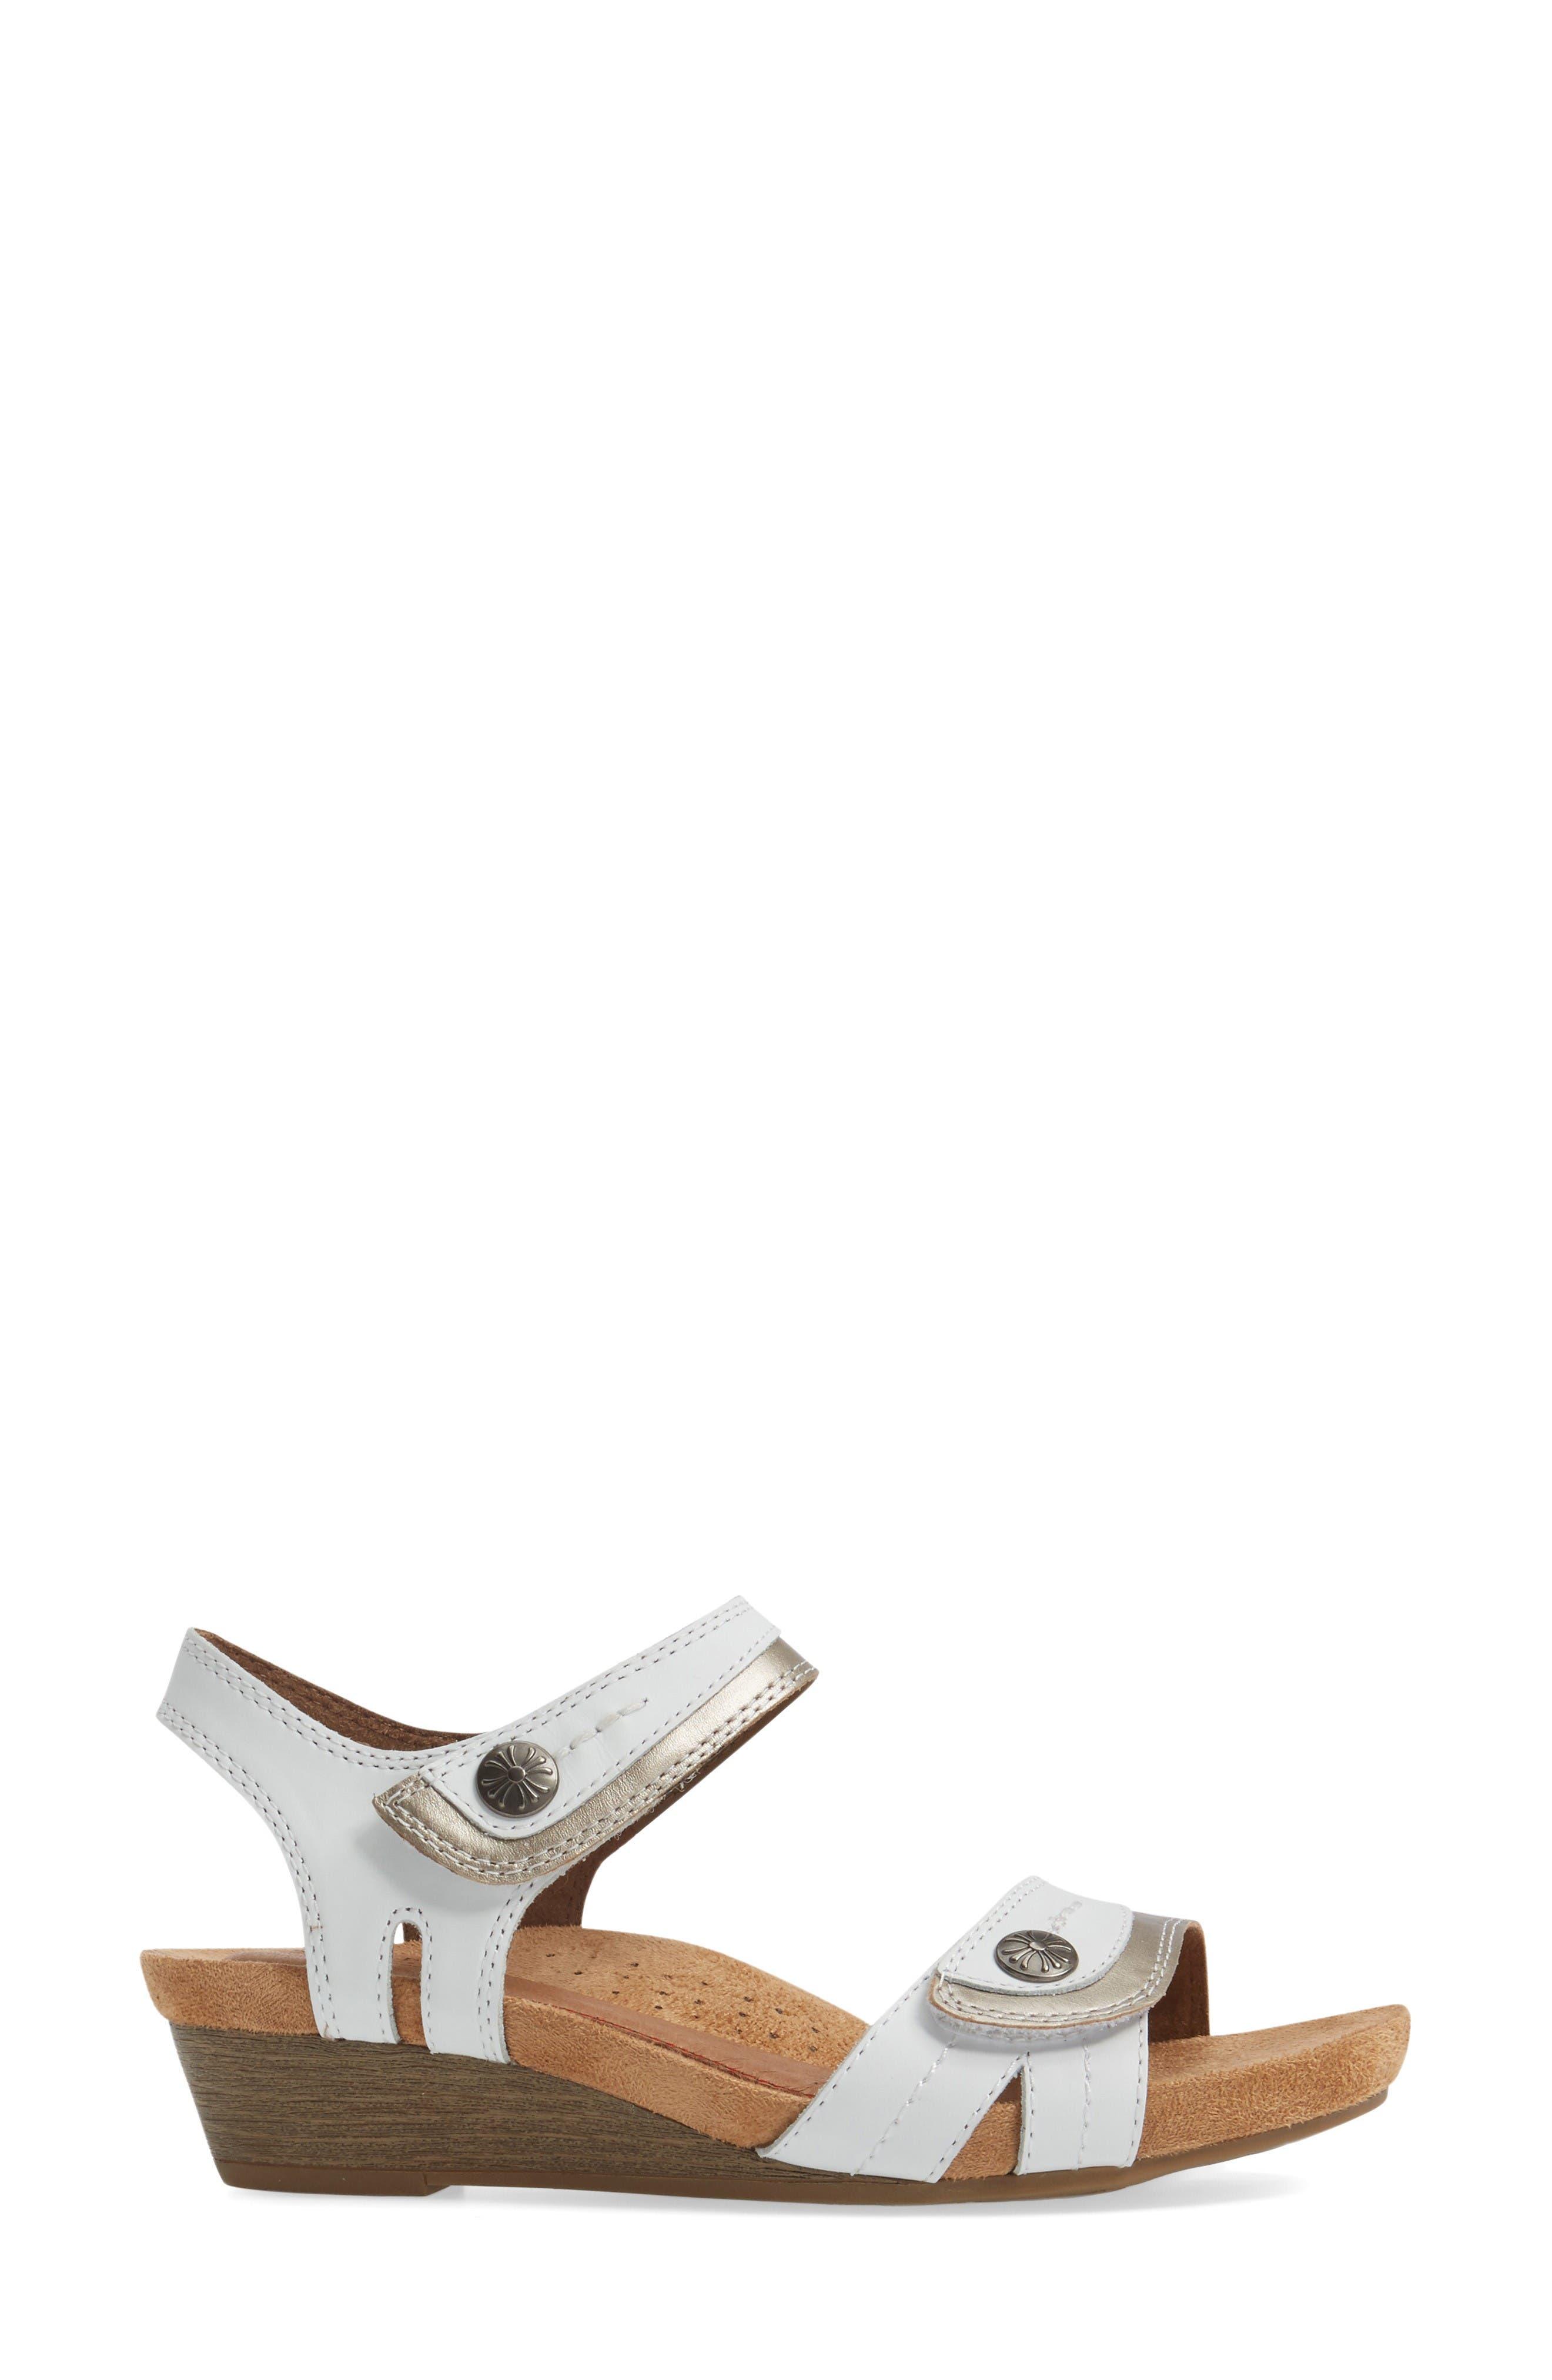 Hollywood Wedge Sandal,                             Alternate thumbnail 3, color,                             White Leather